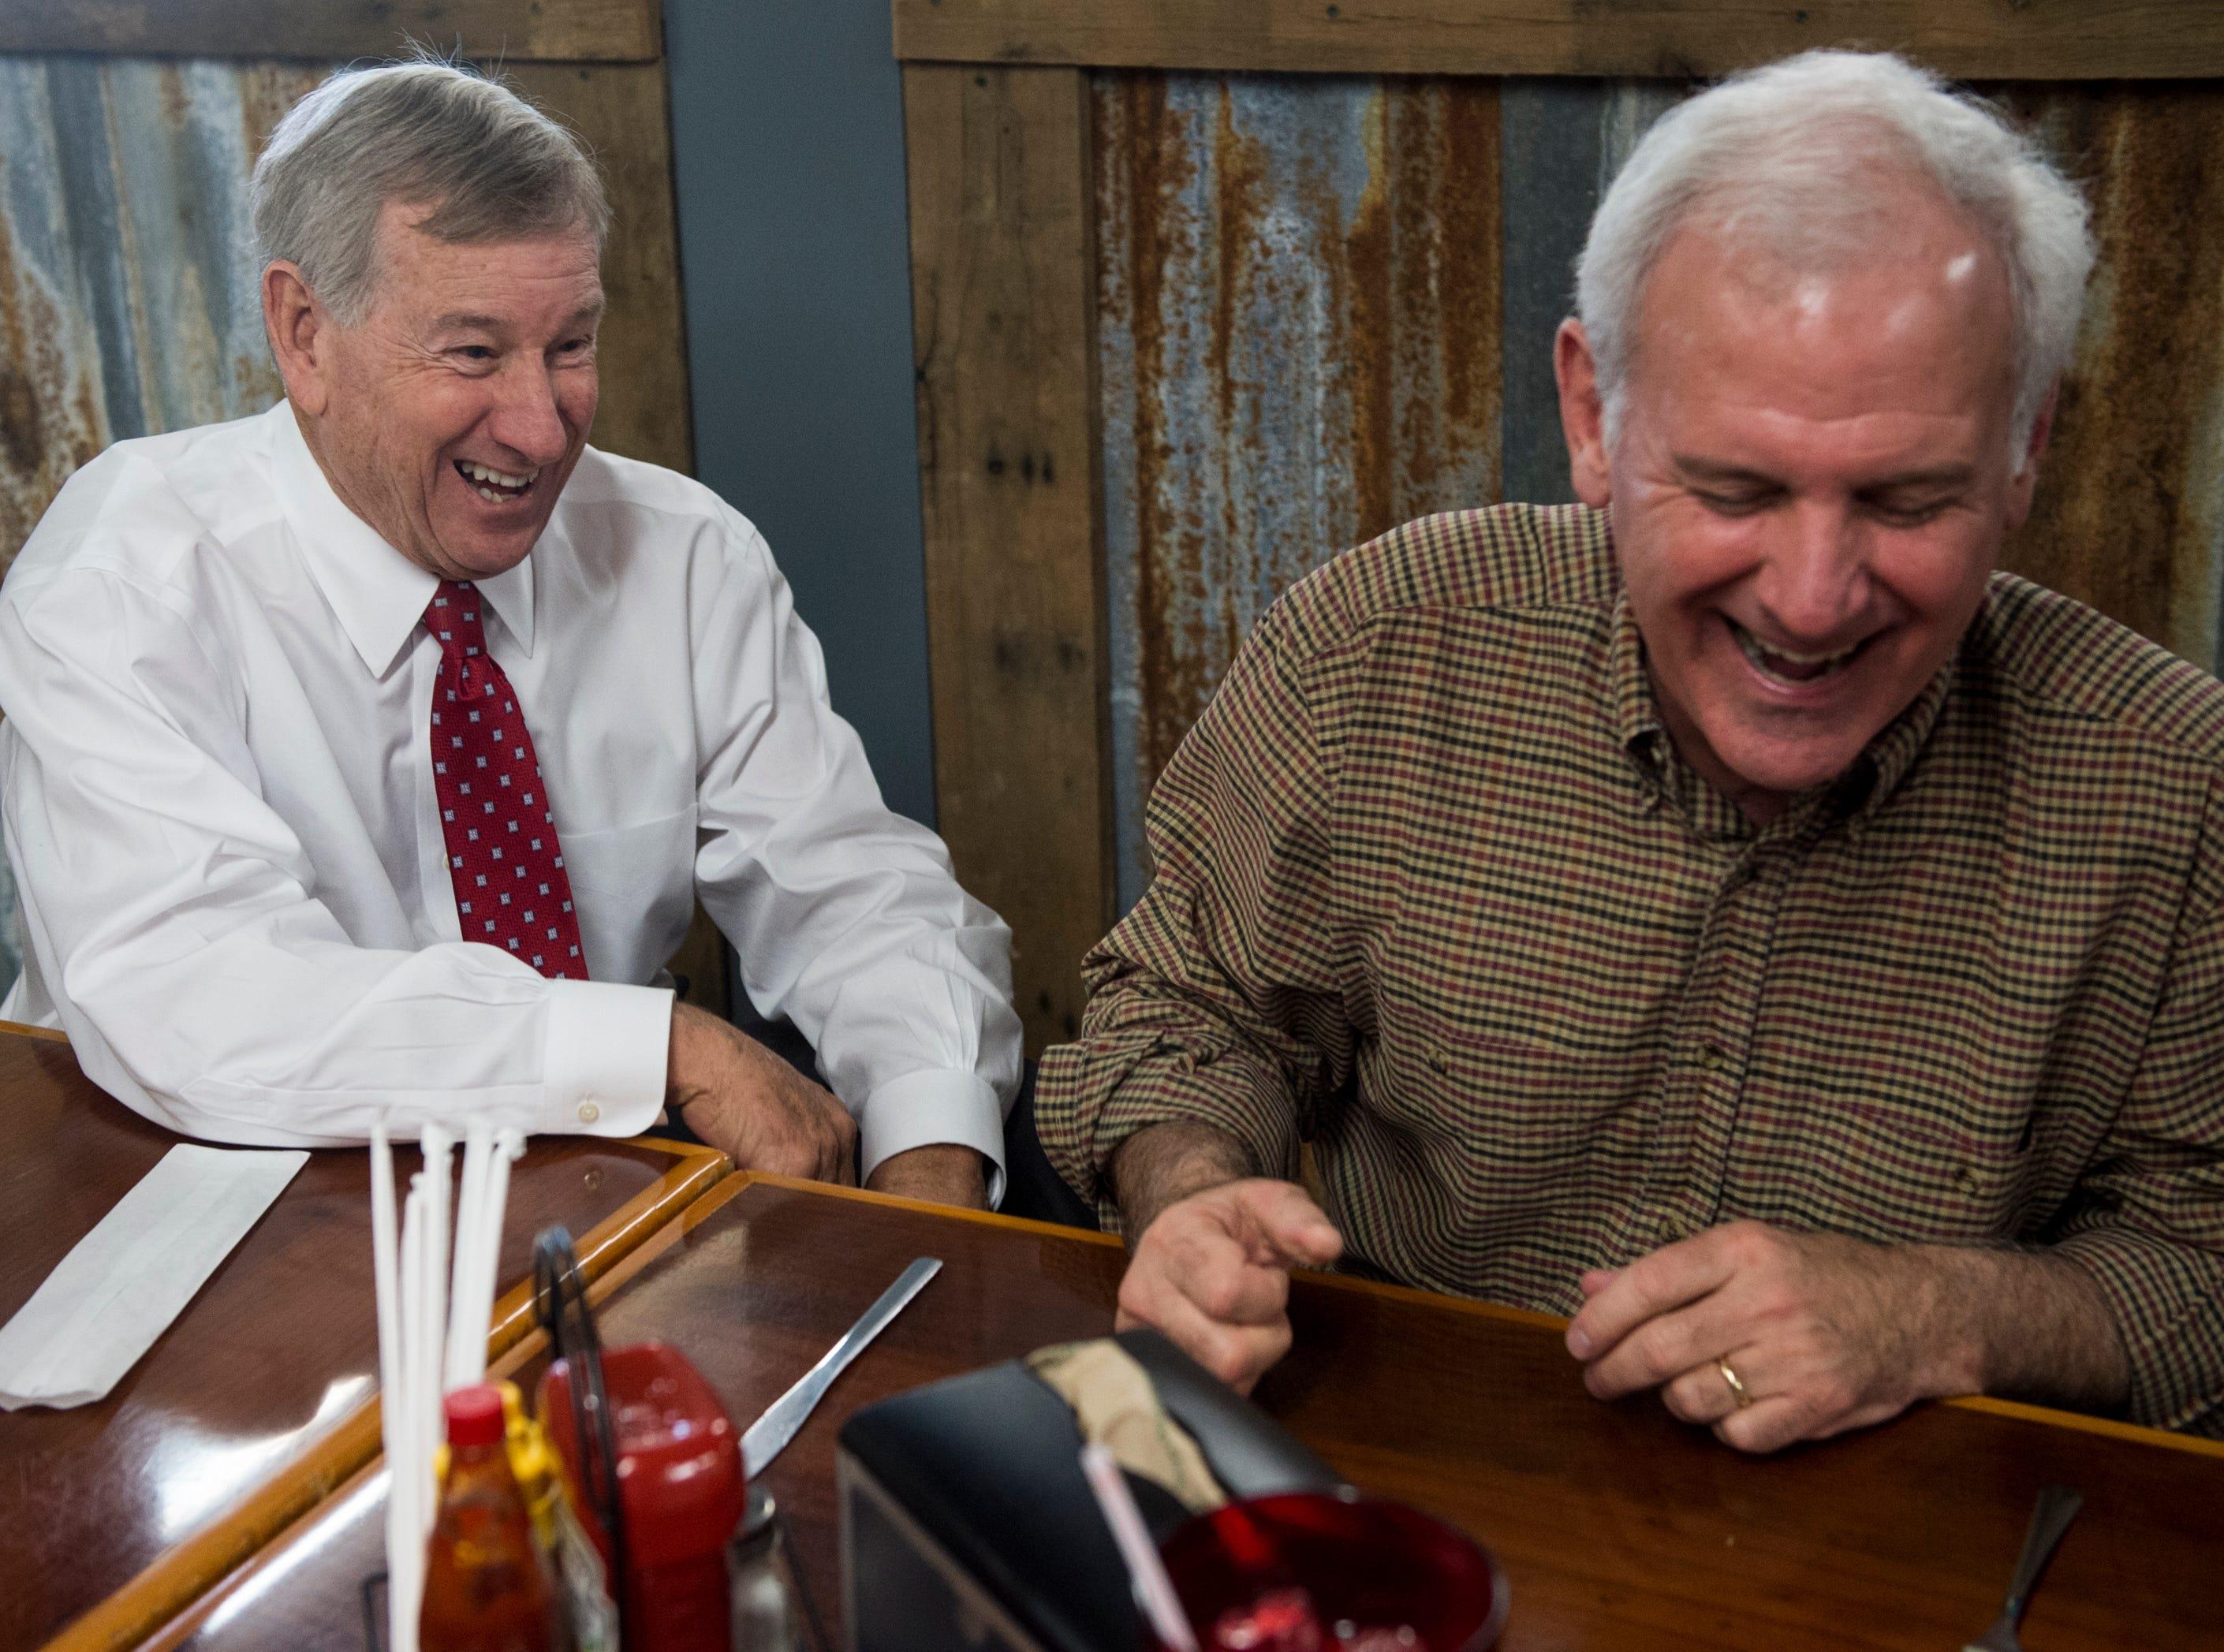 Mayor Todd Strange and U.S. Rep. Bradley Byrne joke around at Yellowhammer Cafe in Montgomery, Ala., on Thursday, Feb. 21, 2019.